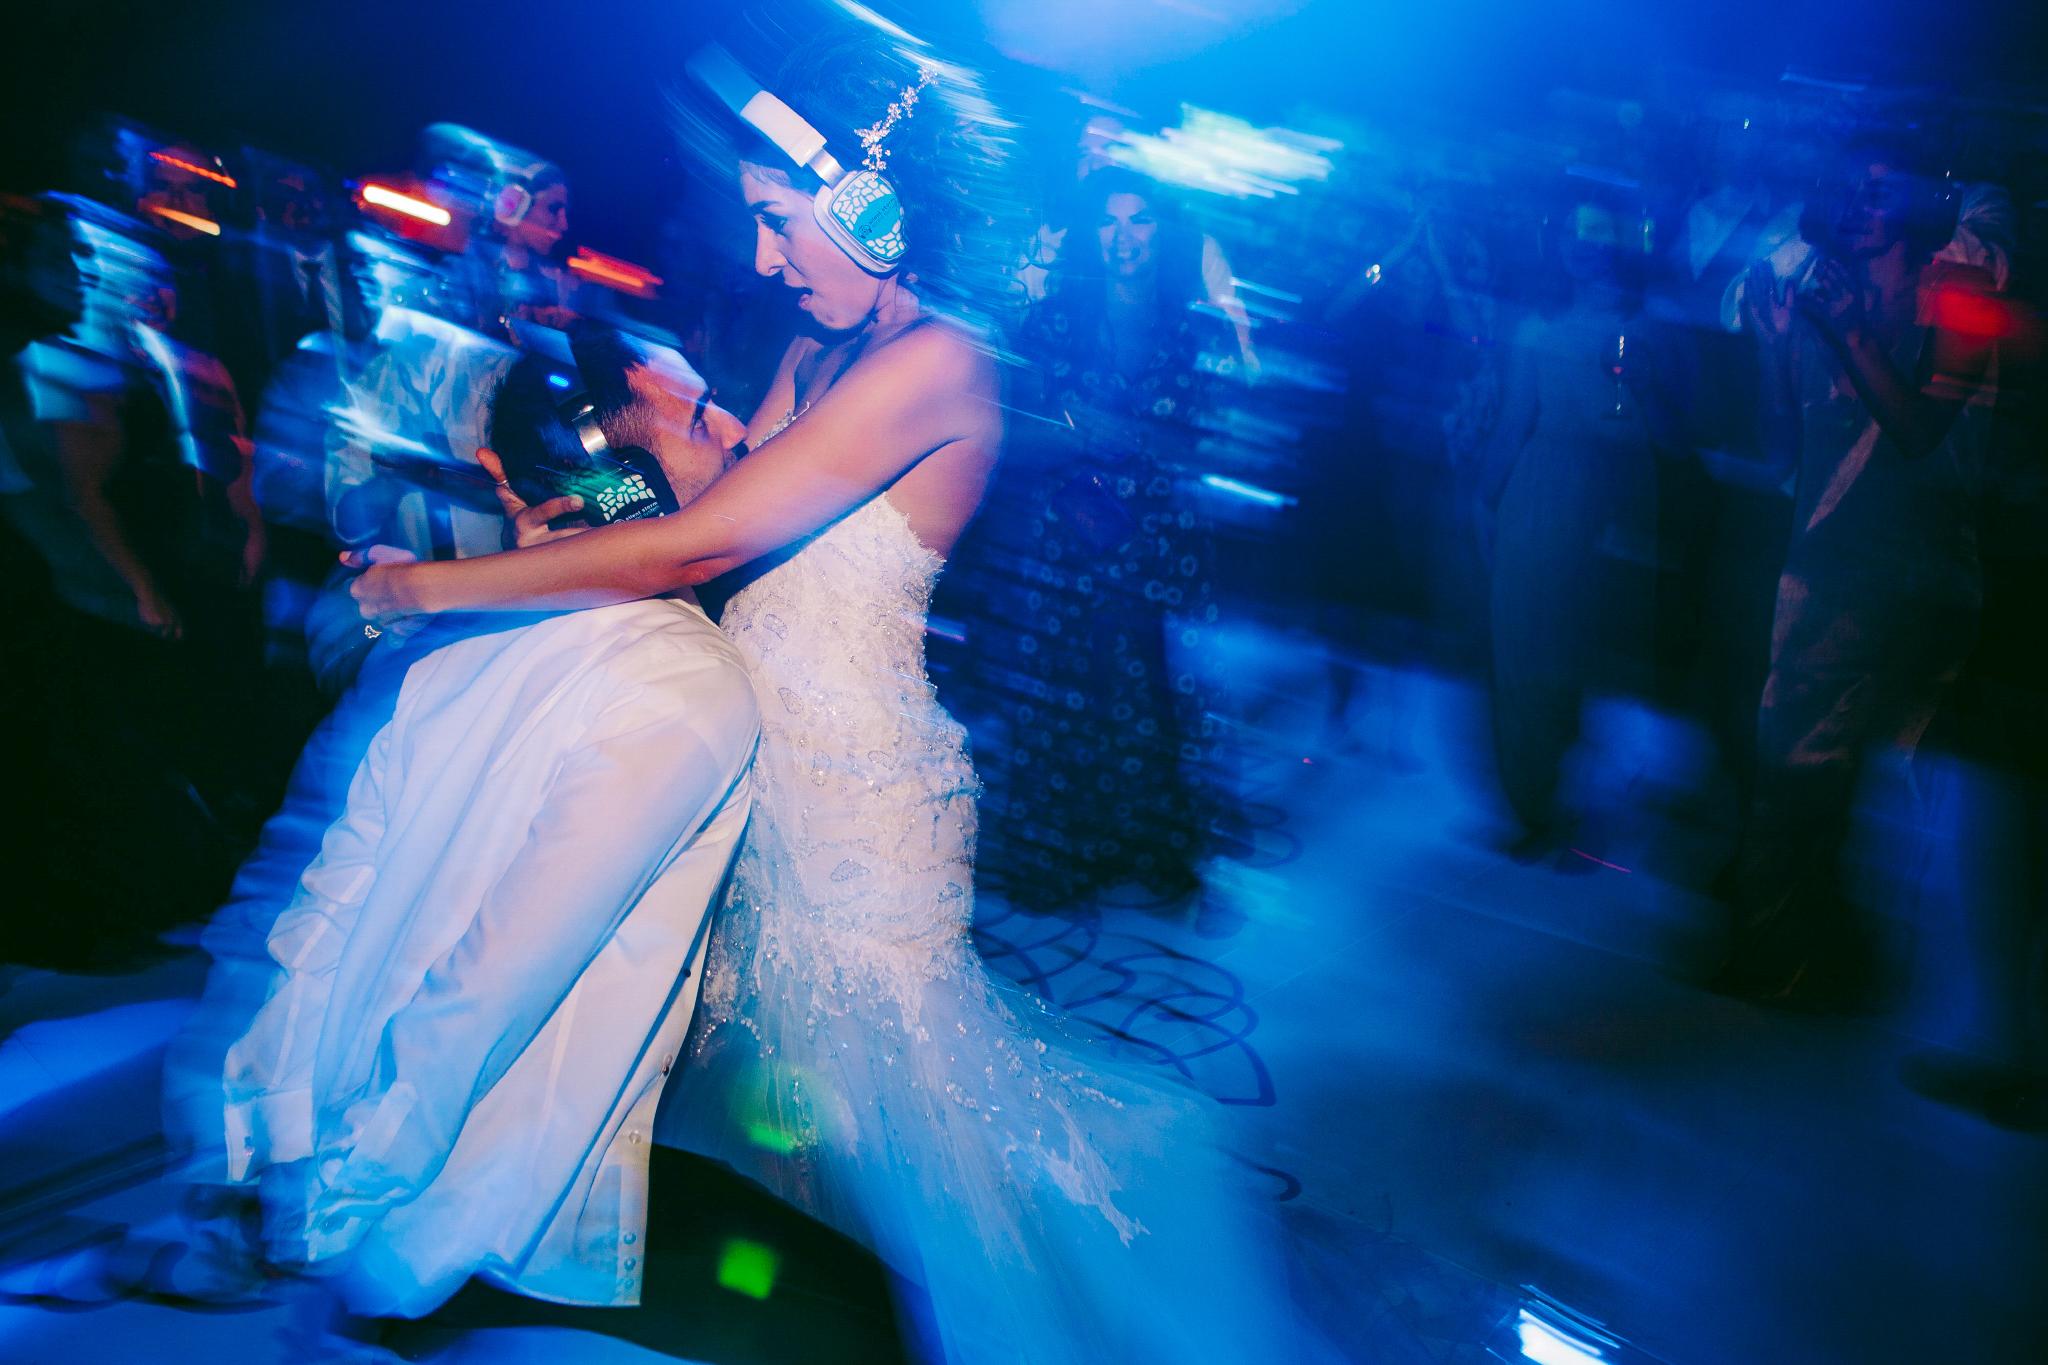 san diego wedding   photographer | married couple wearing noise canceling headphones dancing